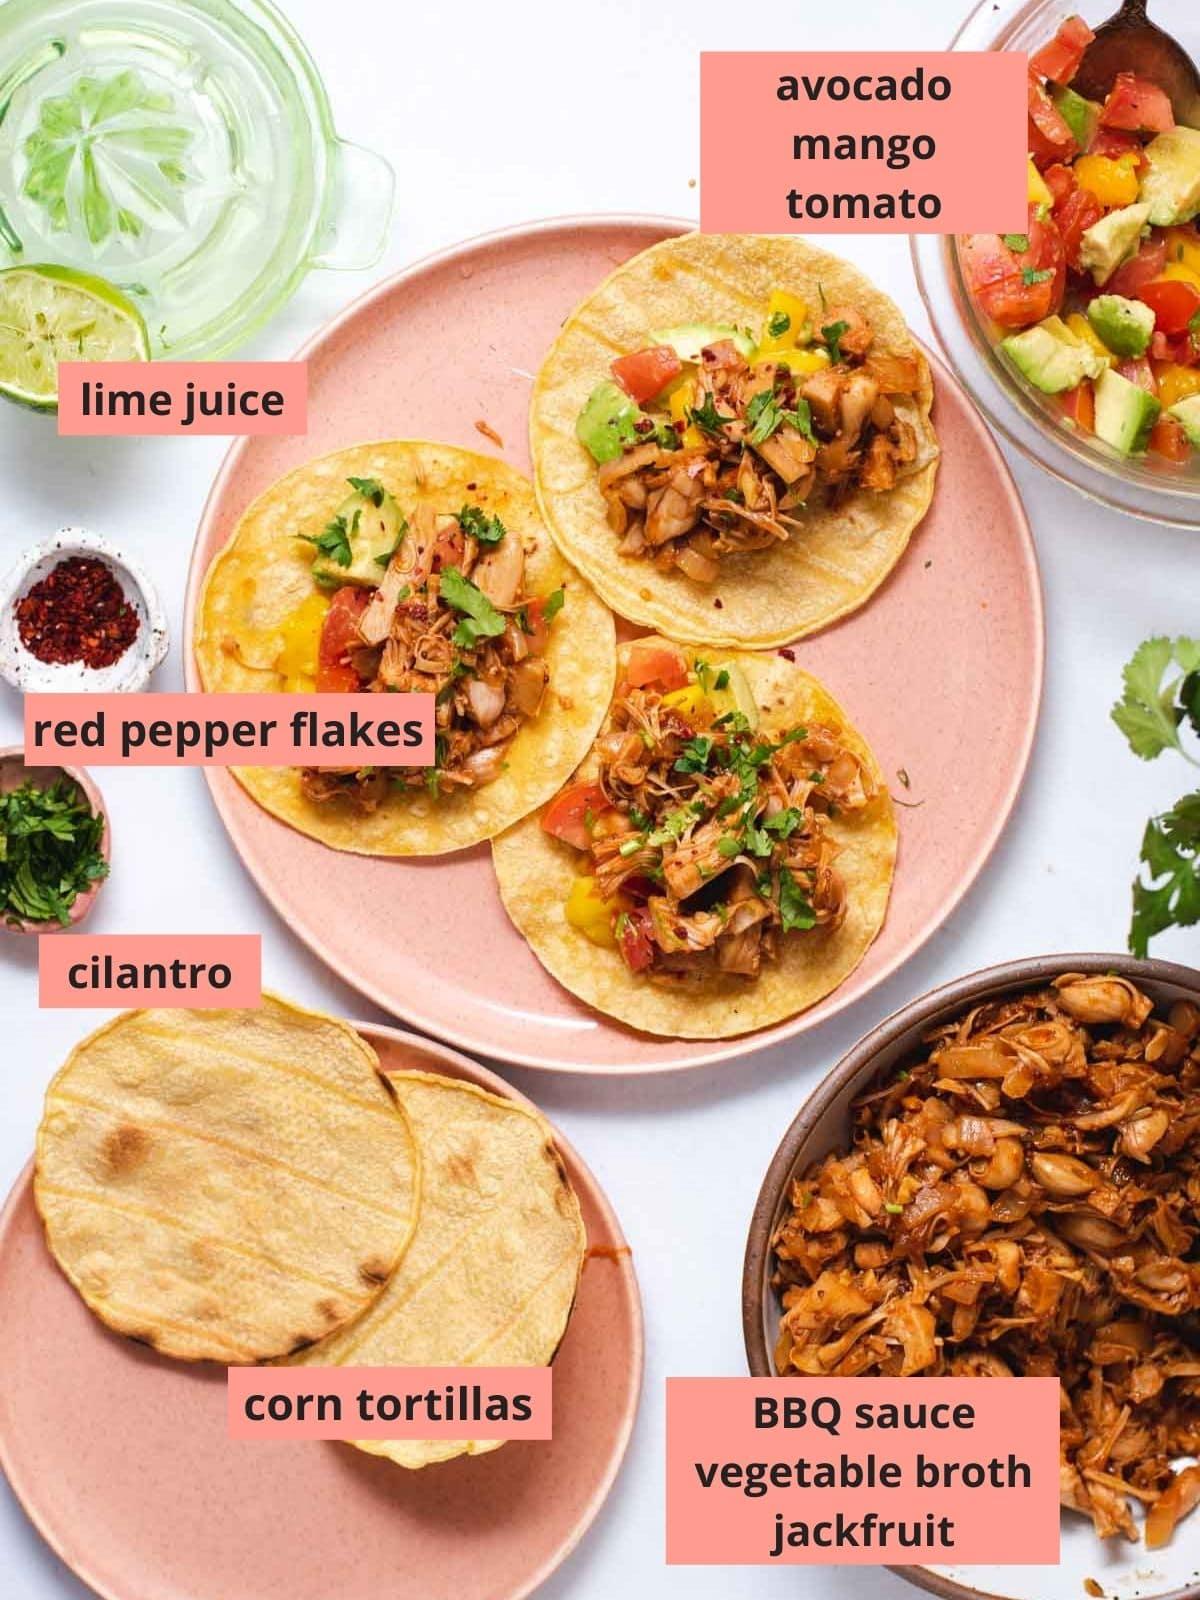 Labeled ingredients used to make jackfruit tacos